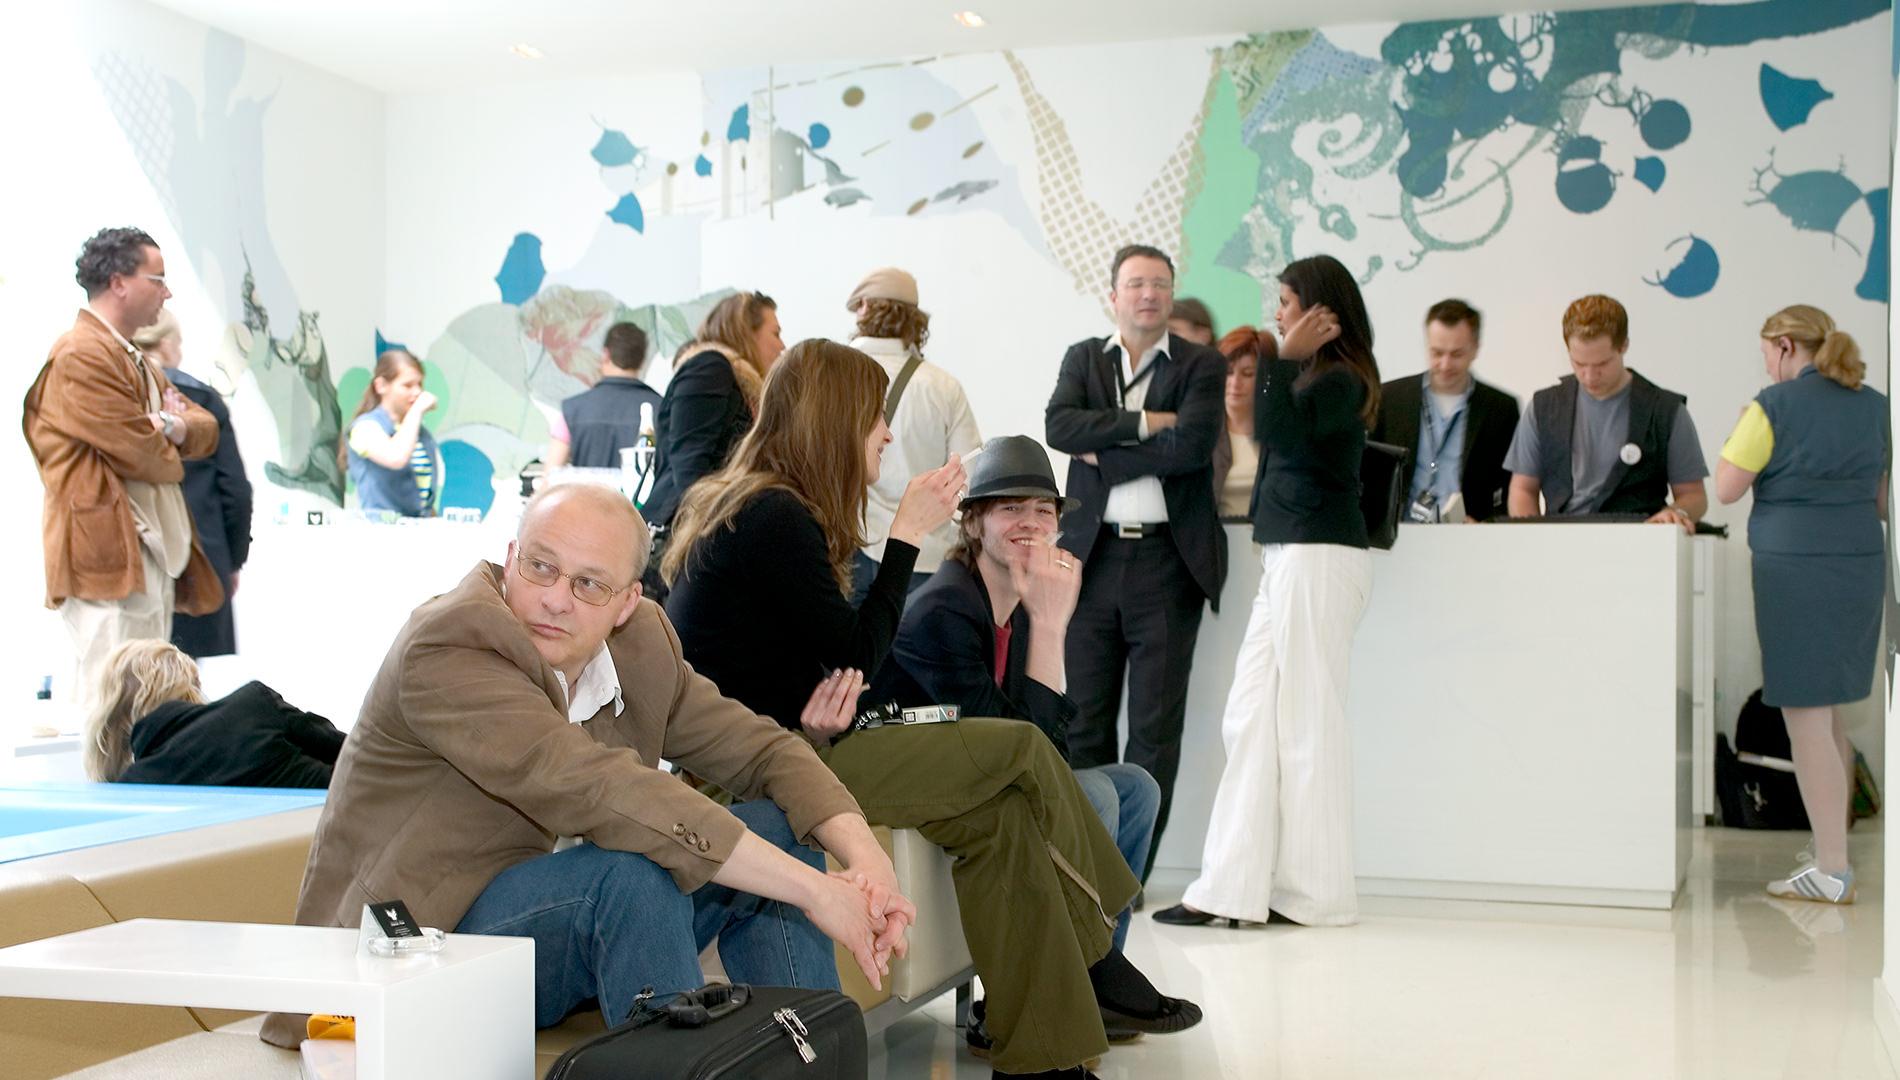 Messe Design Live Kommunikation Kopenhagen VW Projekt Fox Hotel Empfang Lounge Gäste Going Places EventLabs